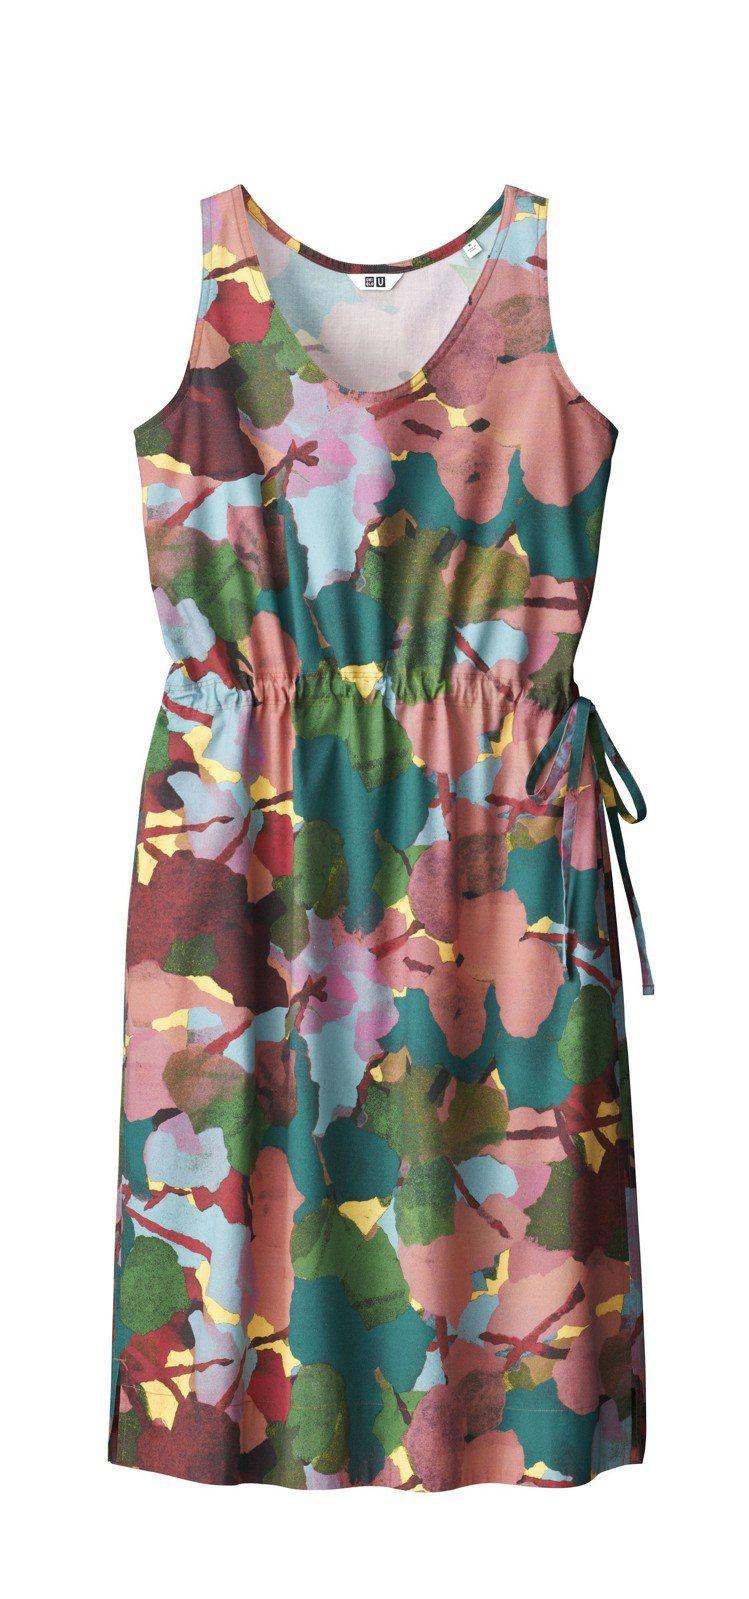 Uniqlo U系列女裝無袖抽繩印花洋裝1,490元。圖/Uniqlo提供